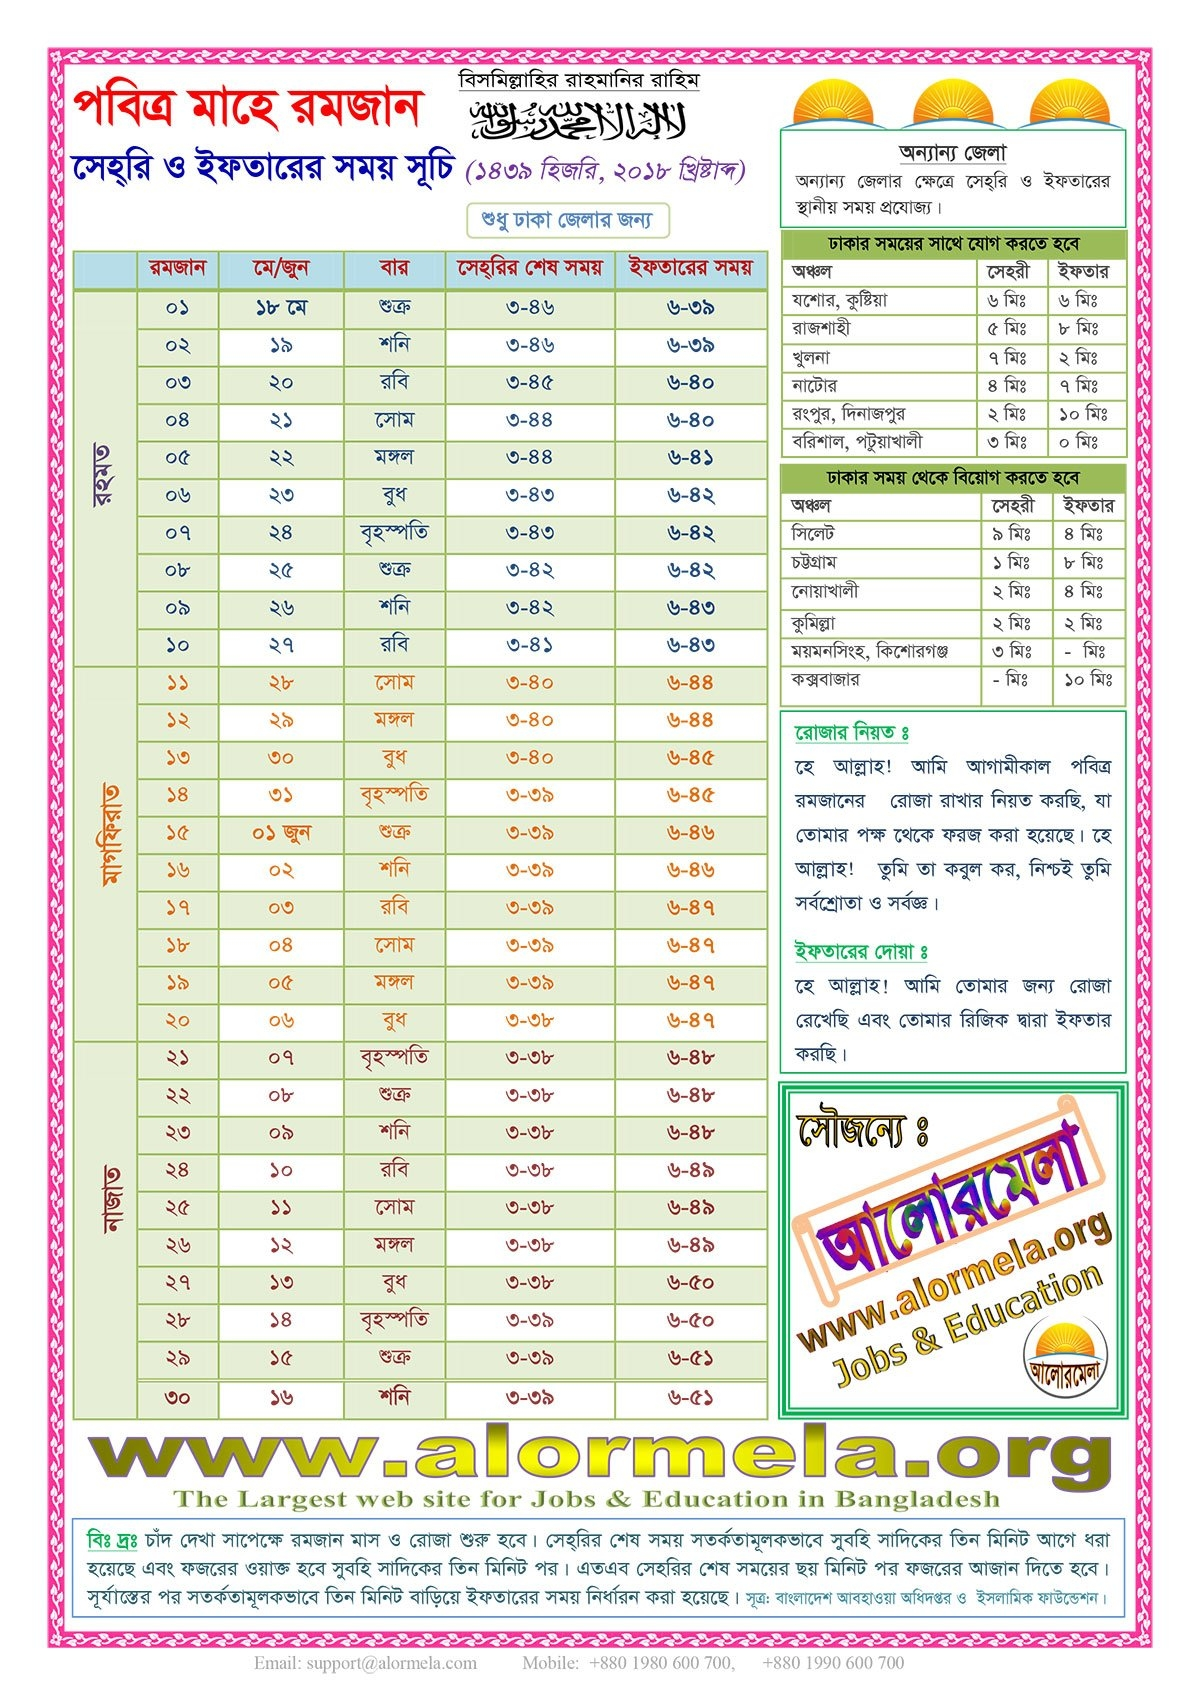 Ramadan Calendar 2018, Hijri 1439 - Alormela Calendar 2019 Ramadan